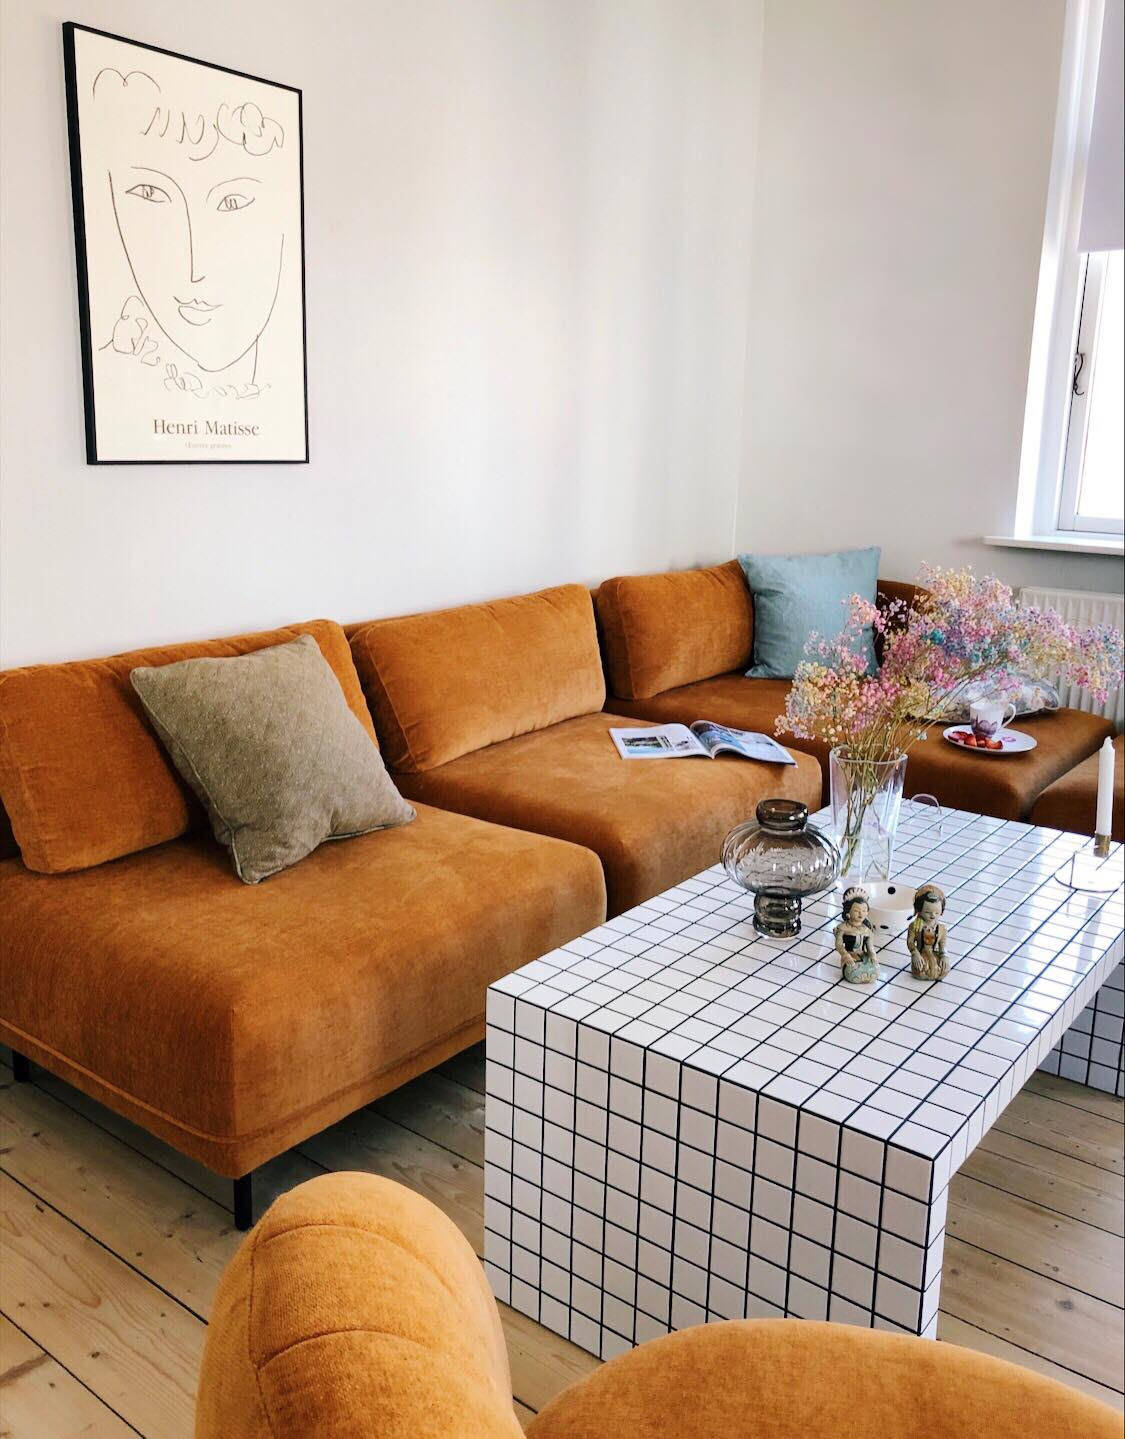 Vores Nye Sofa Fra Sofakompagniet Christine Delmar